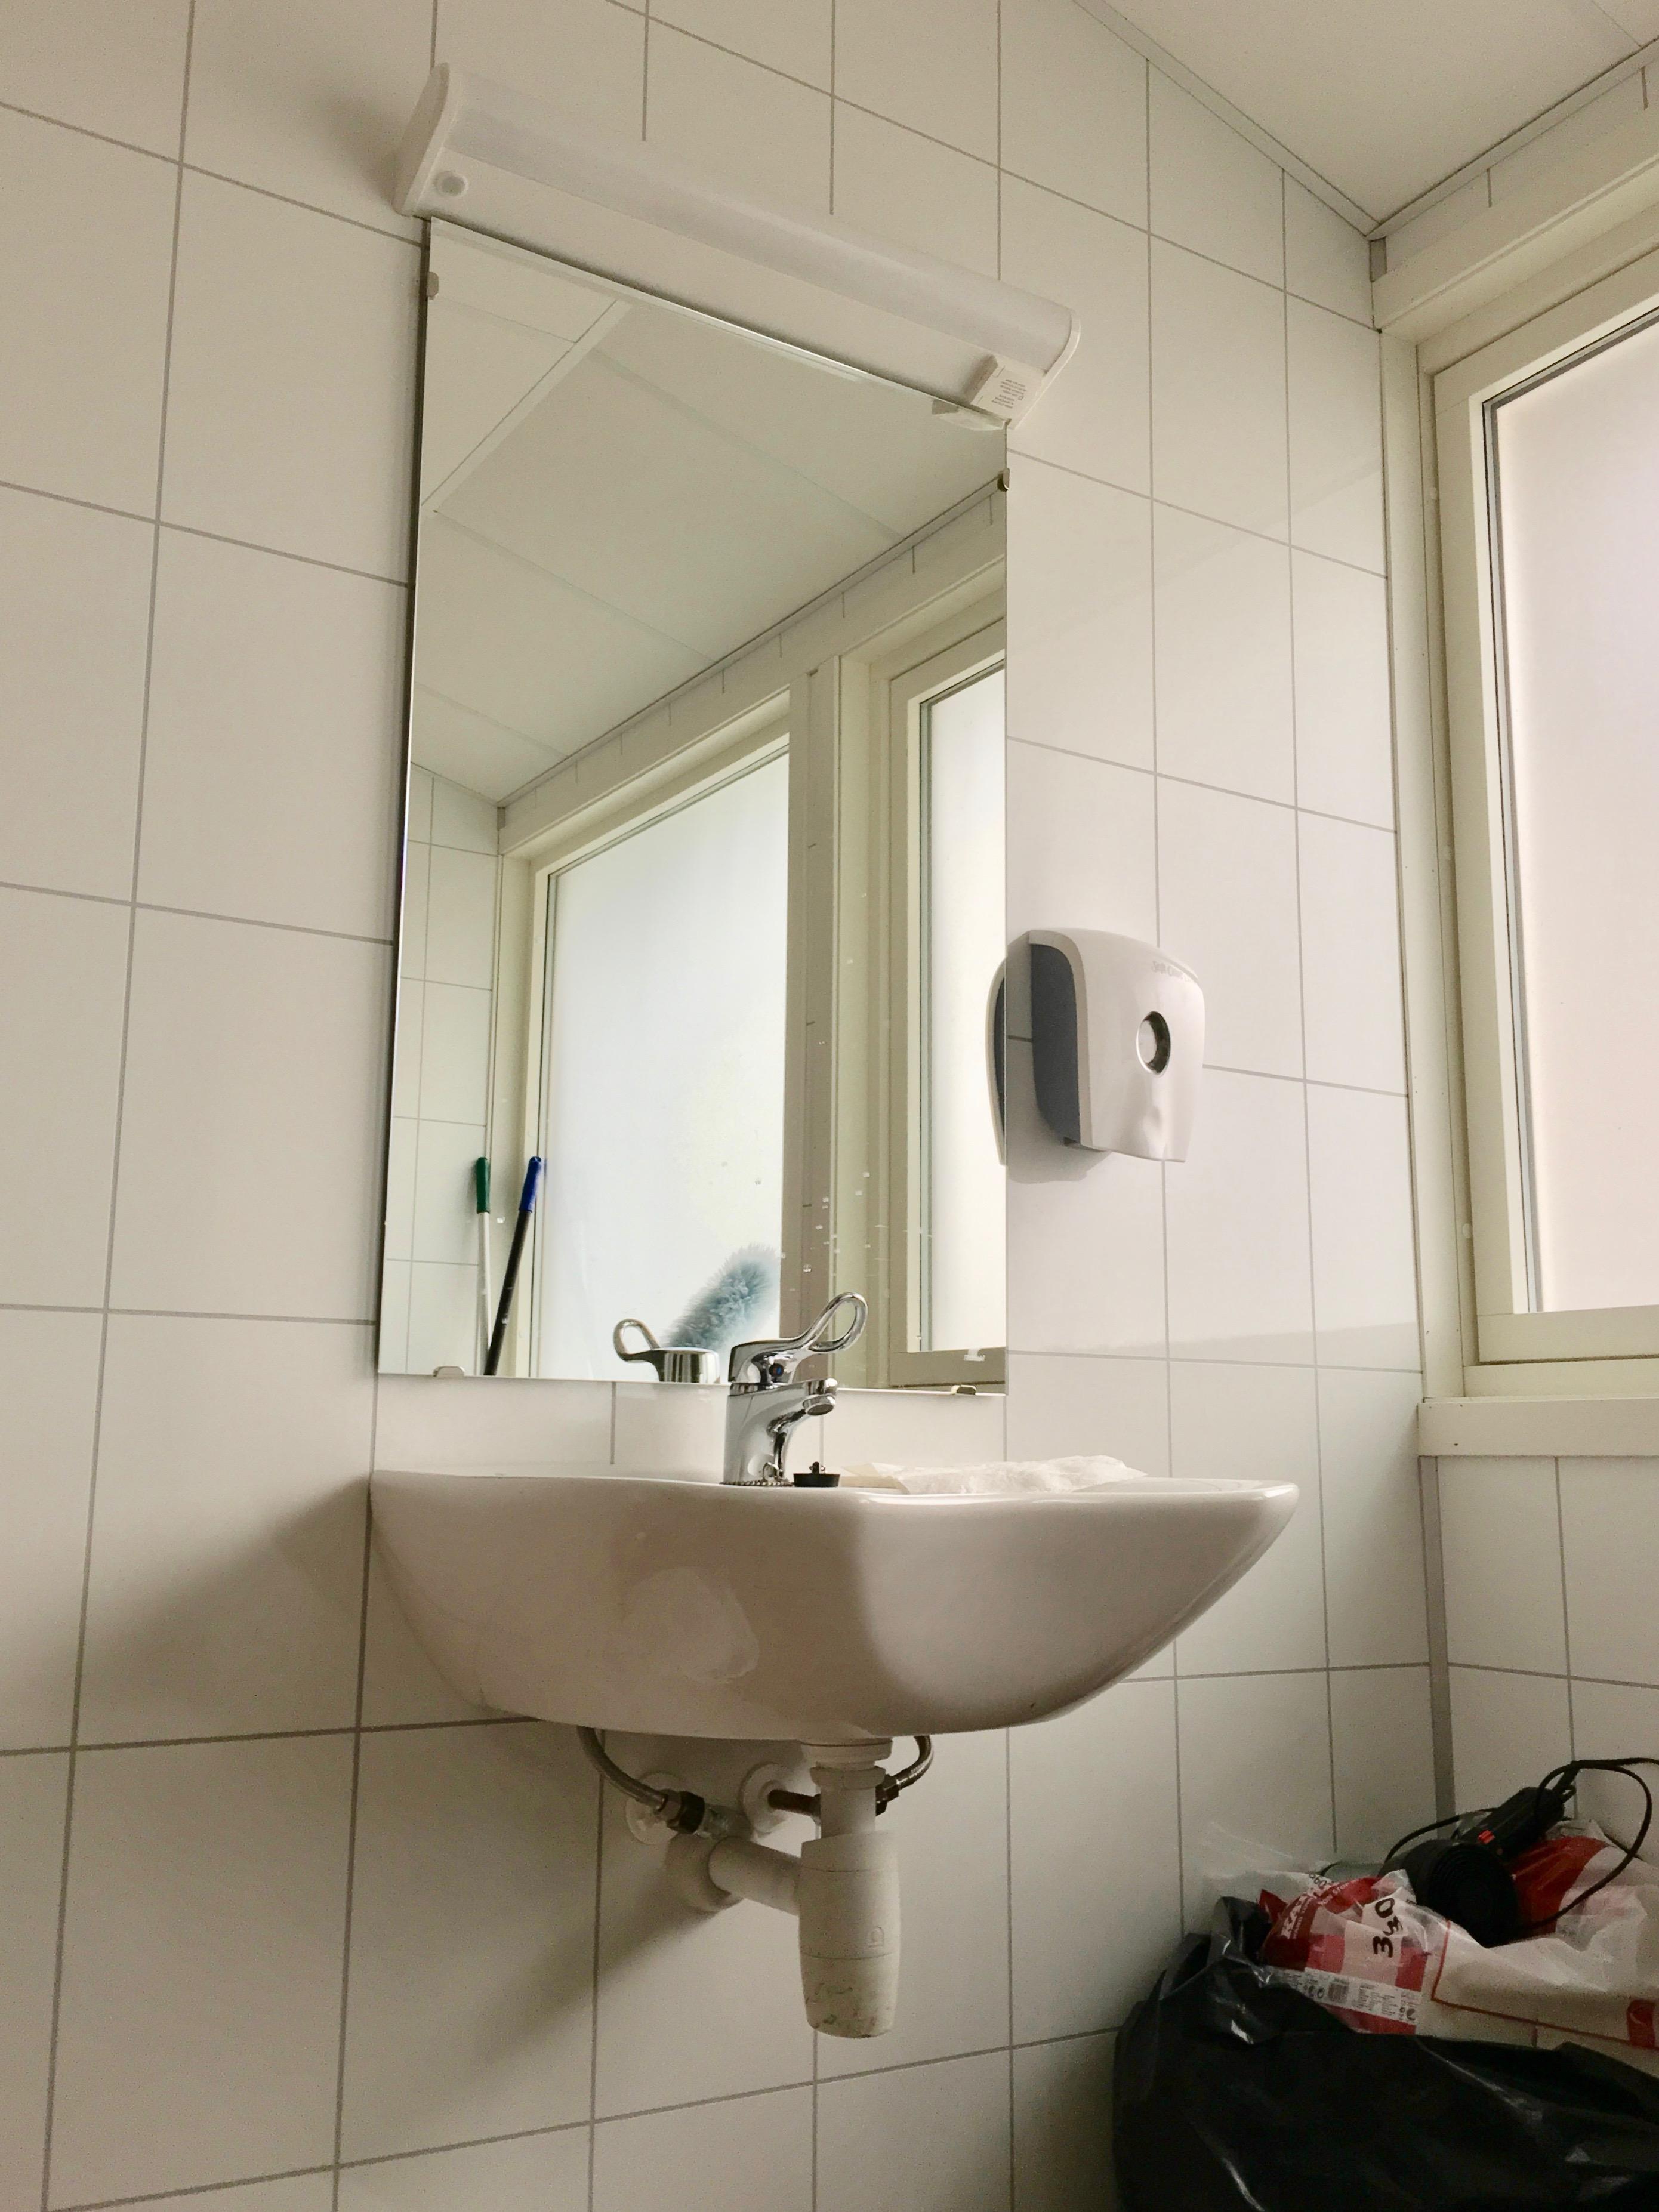 school bathroom mirror FileToiletsink Mirror Etc In